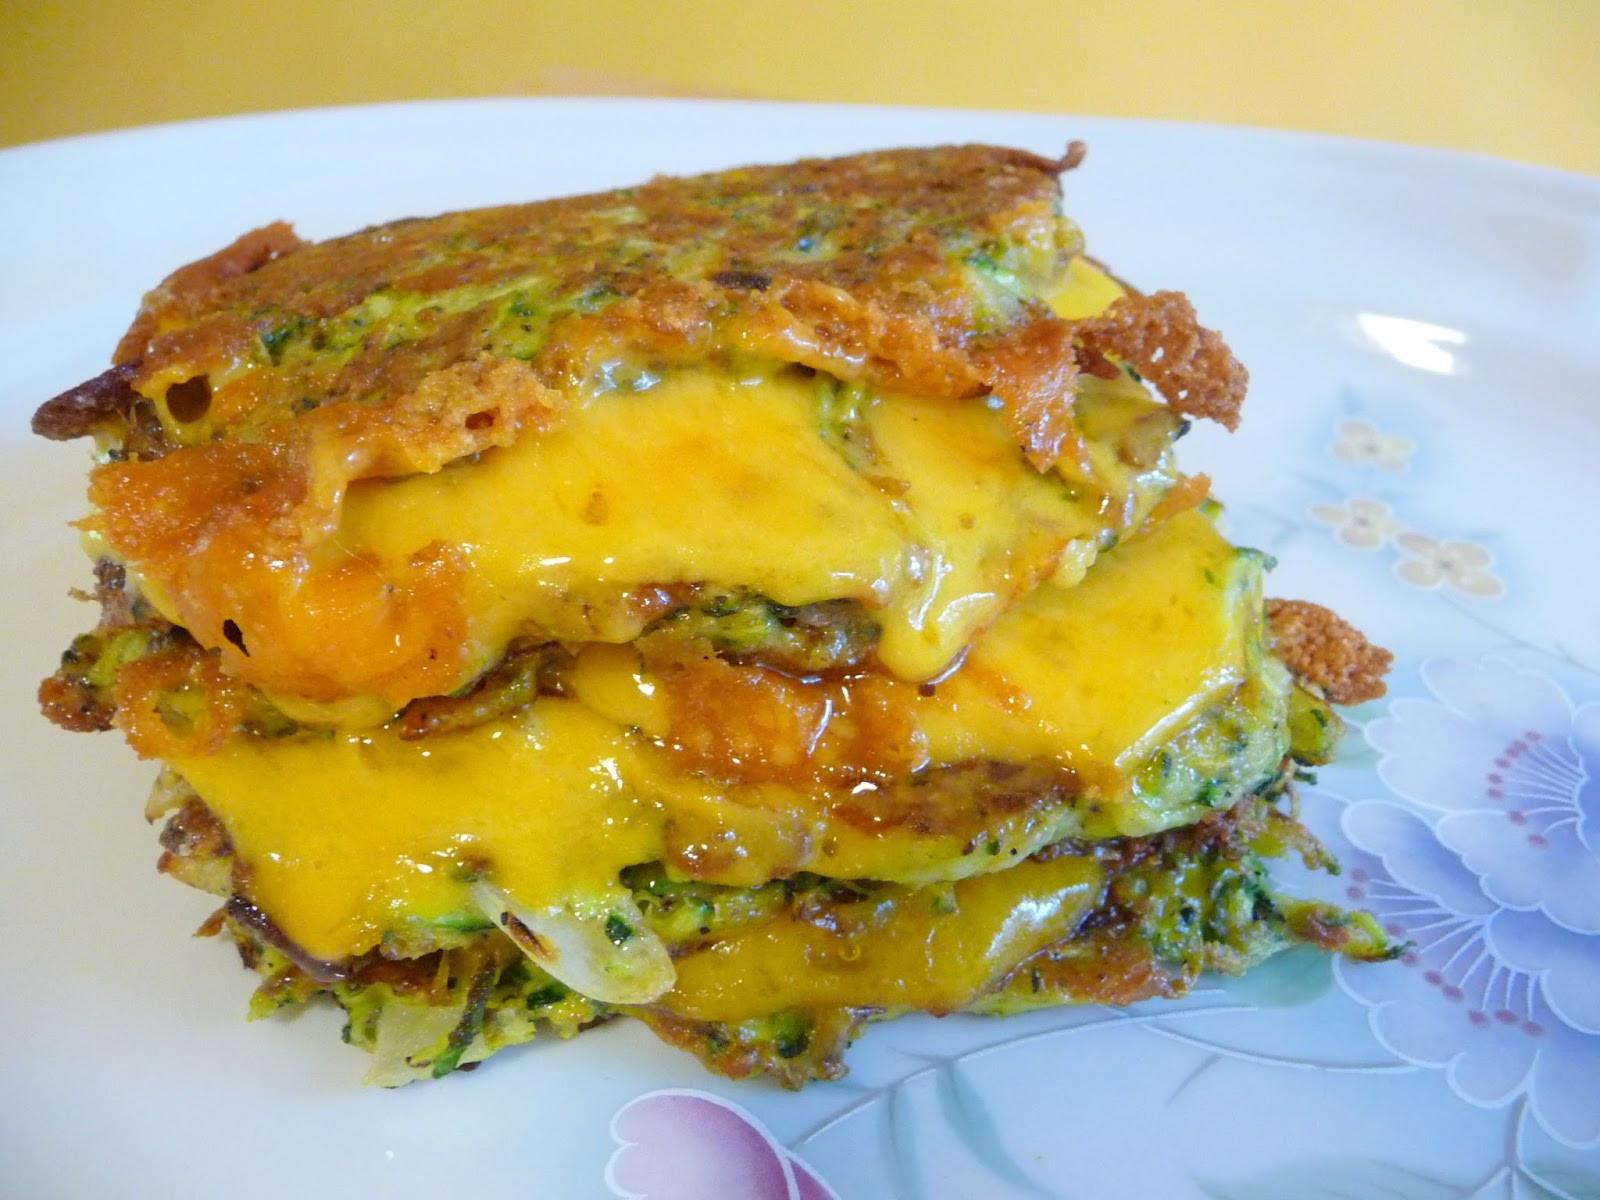 Low Carb Zucchini Cheese Bread  SPLENDID LOW CARBING BY JENNIFER ELOFF ZUCCHINI GRILLED